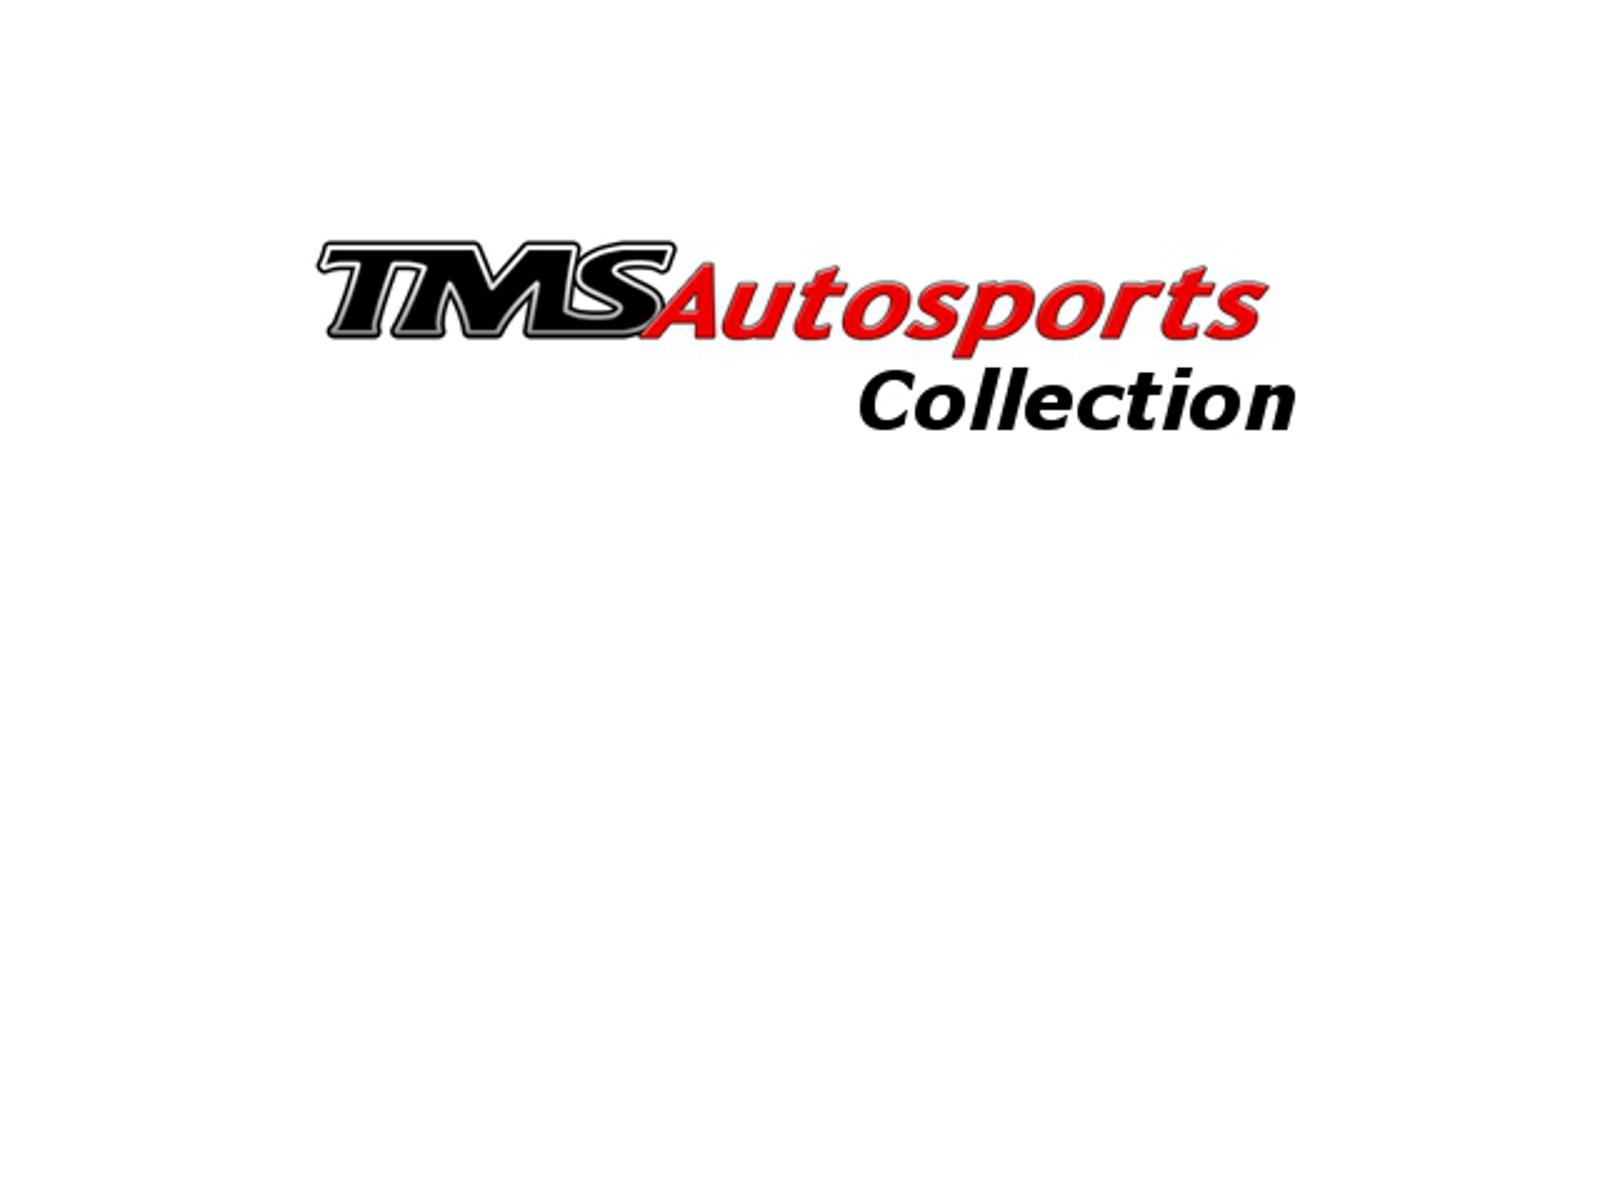 tmsautosports-collection-logo-1600x1200